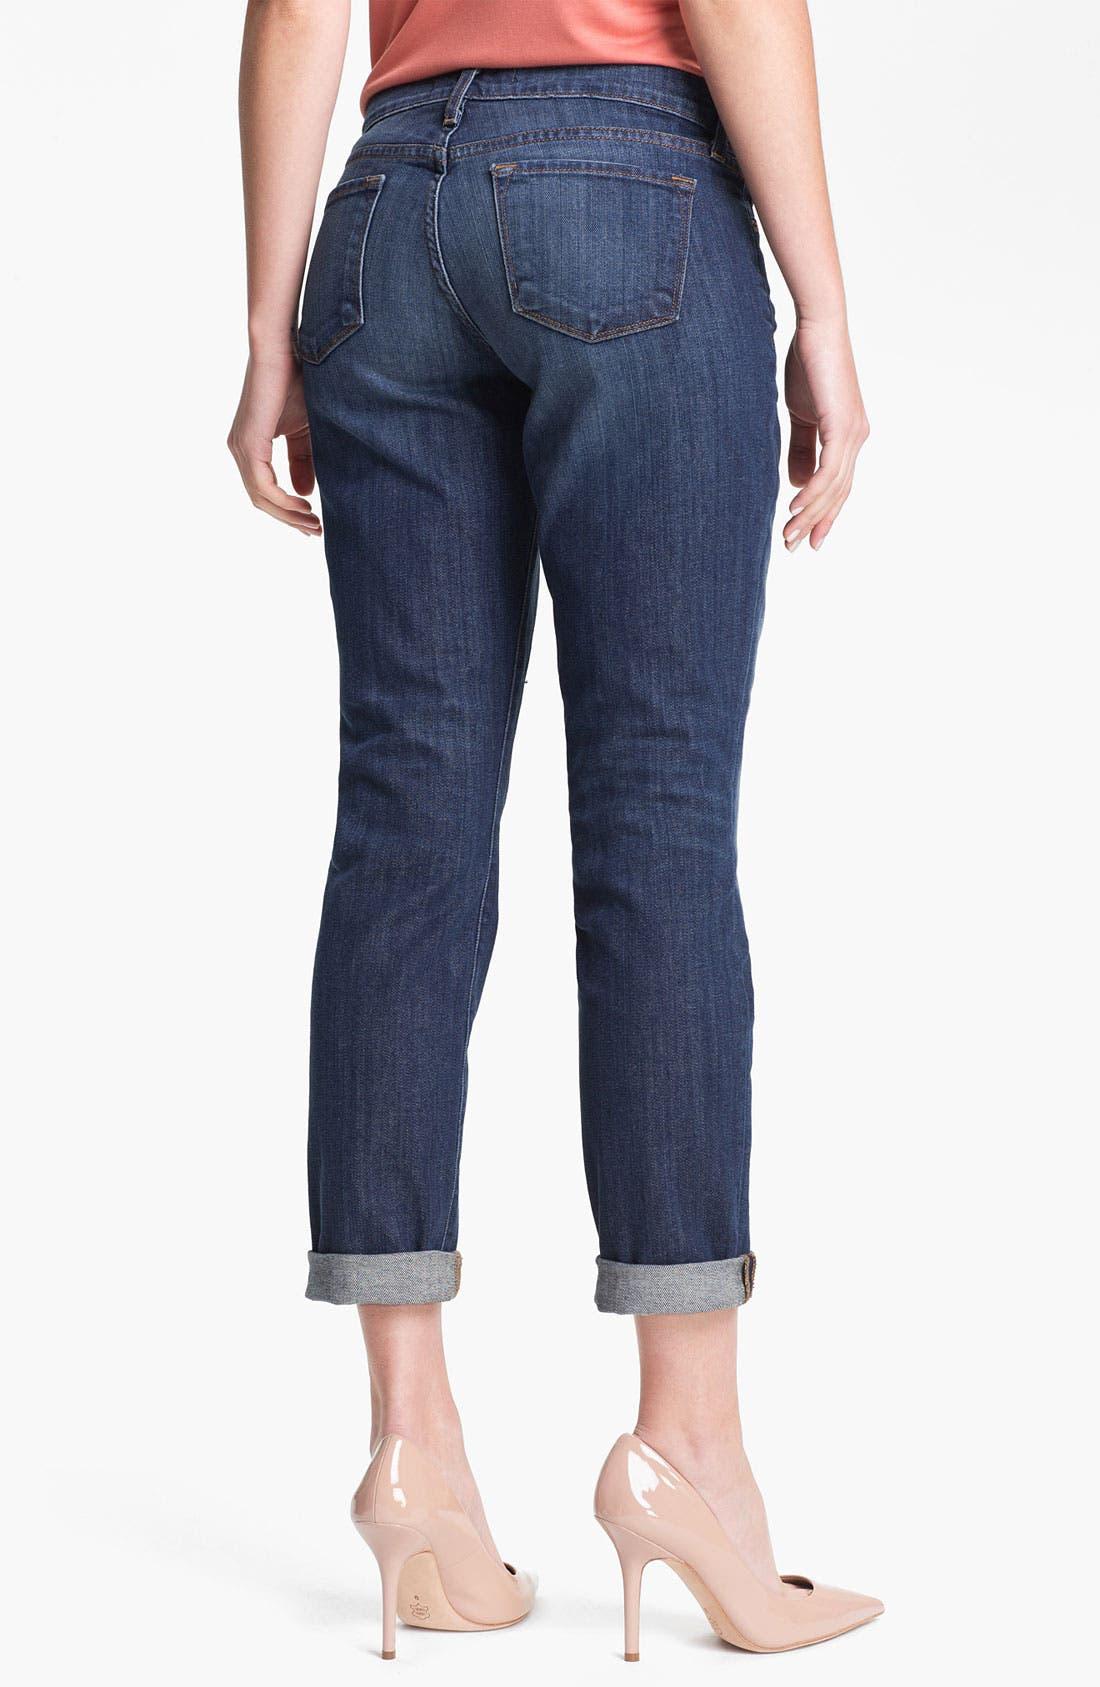 Alternate Image 2  - J Brand 'Midori' Destroyed Boyfriend Jeans (Big Time)